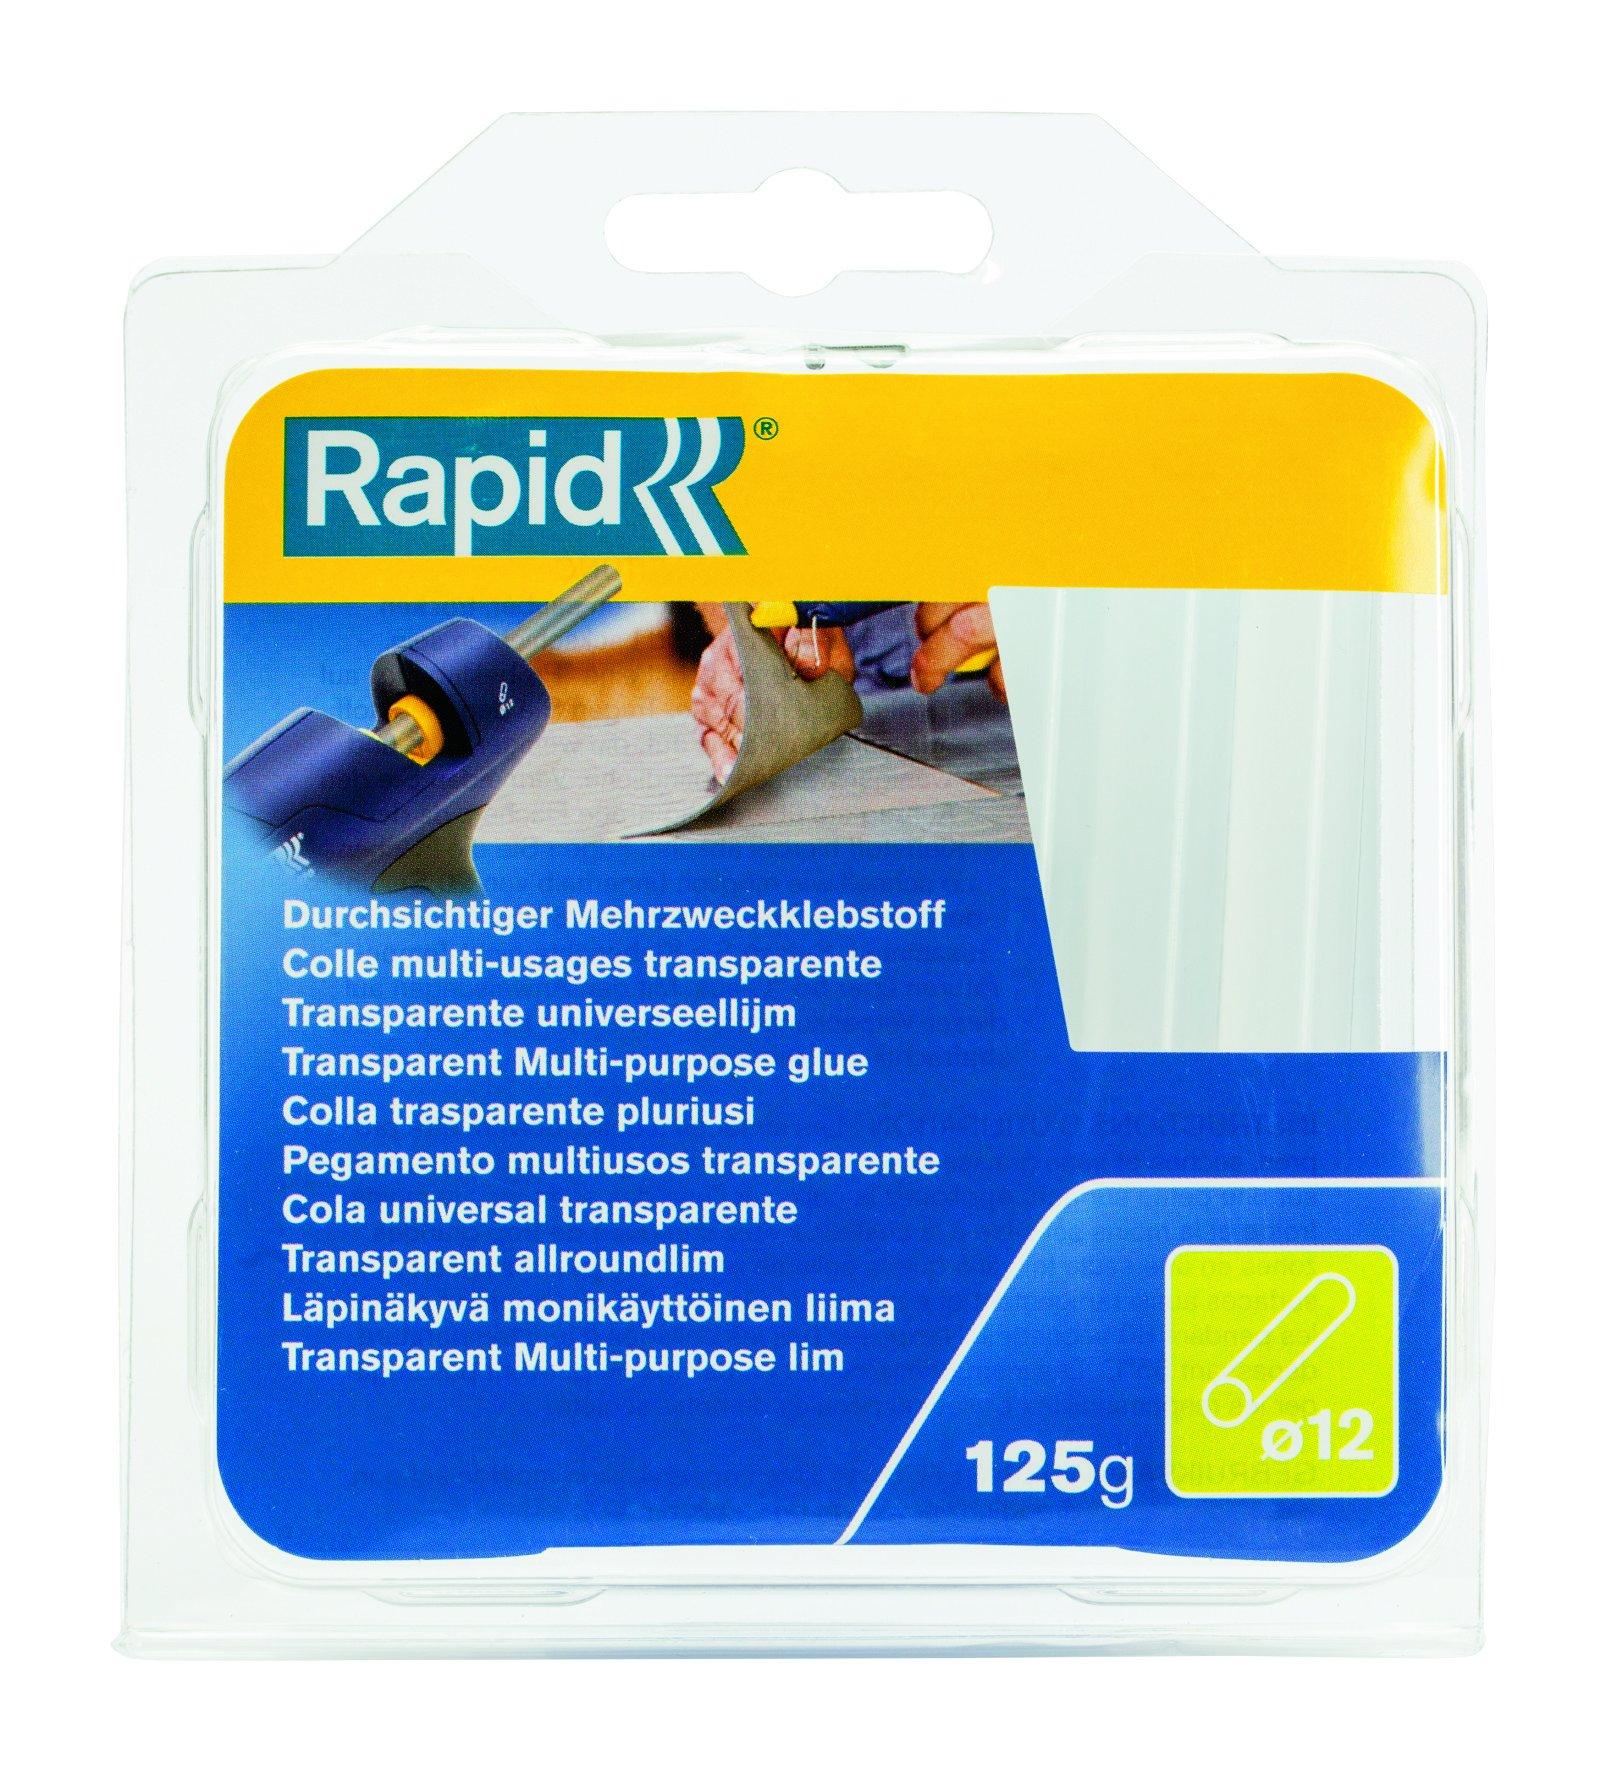 Rapid Stick Di Colla A Caldo, Multiuso, Trasparente, Ø12Mm, Lunghezza 94Mm, 250G, 40107356